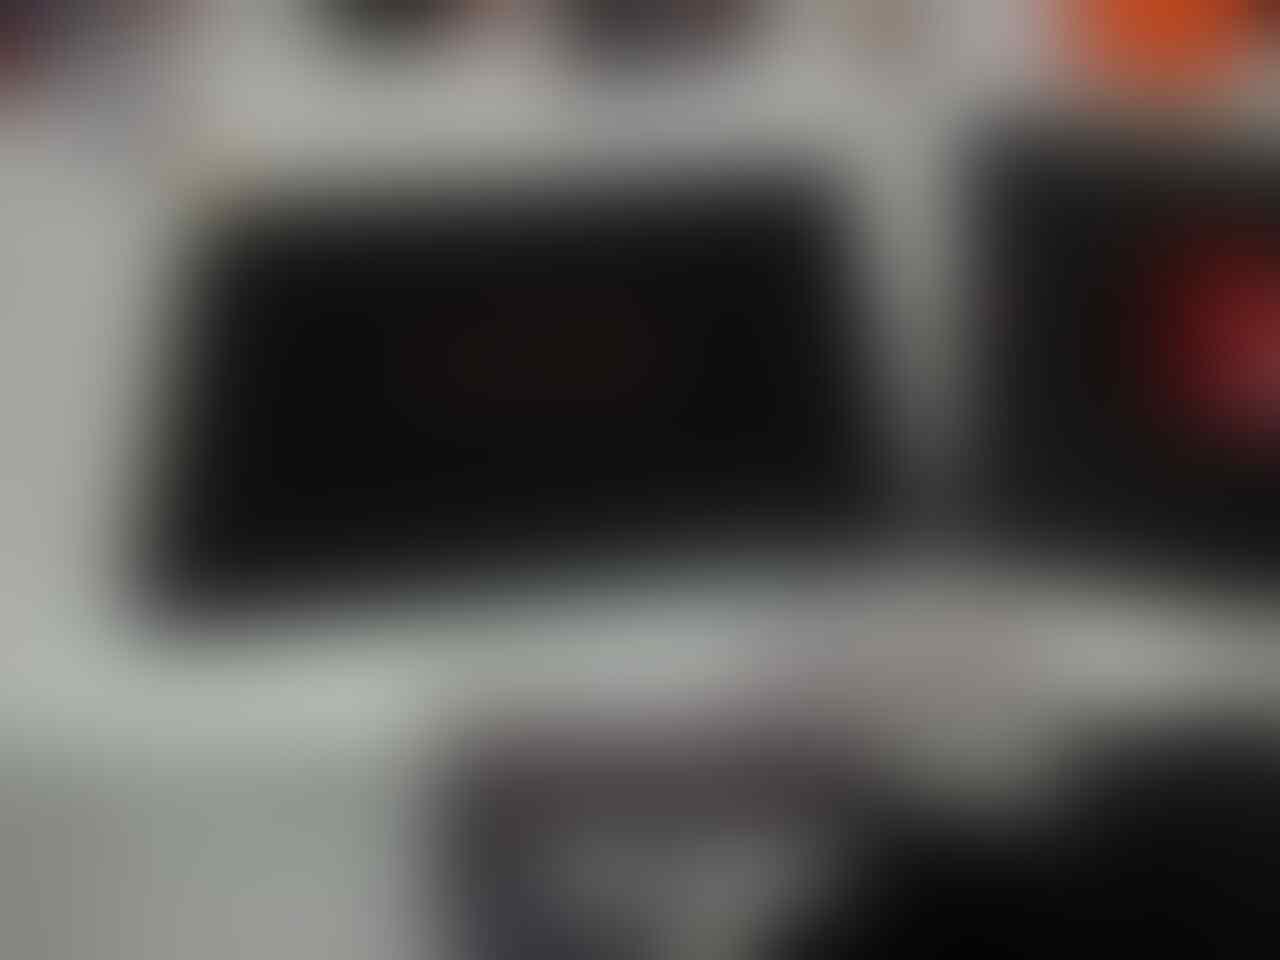 SONY VAIO Core i3 Ram 6GB Murah aje Gan